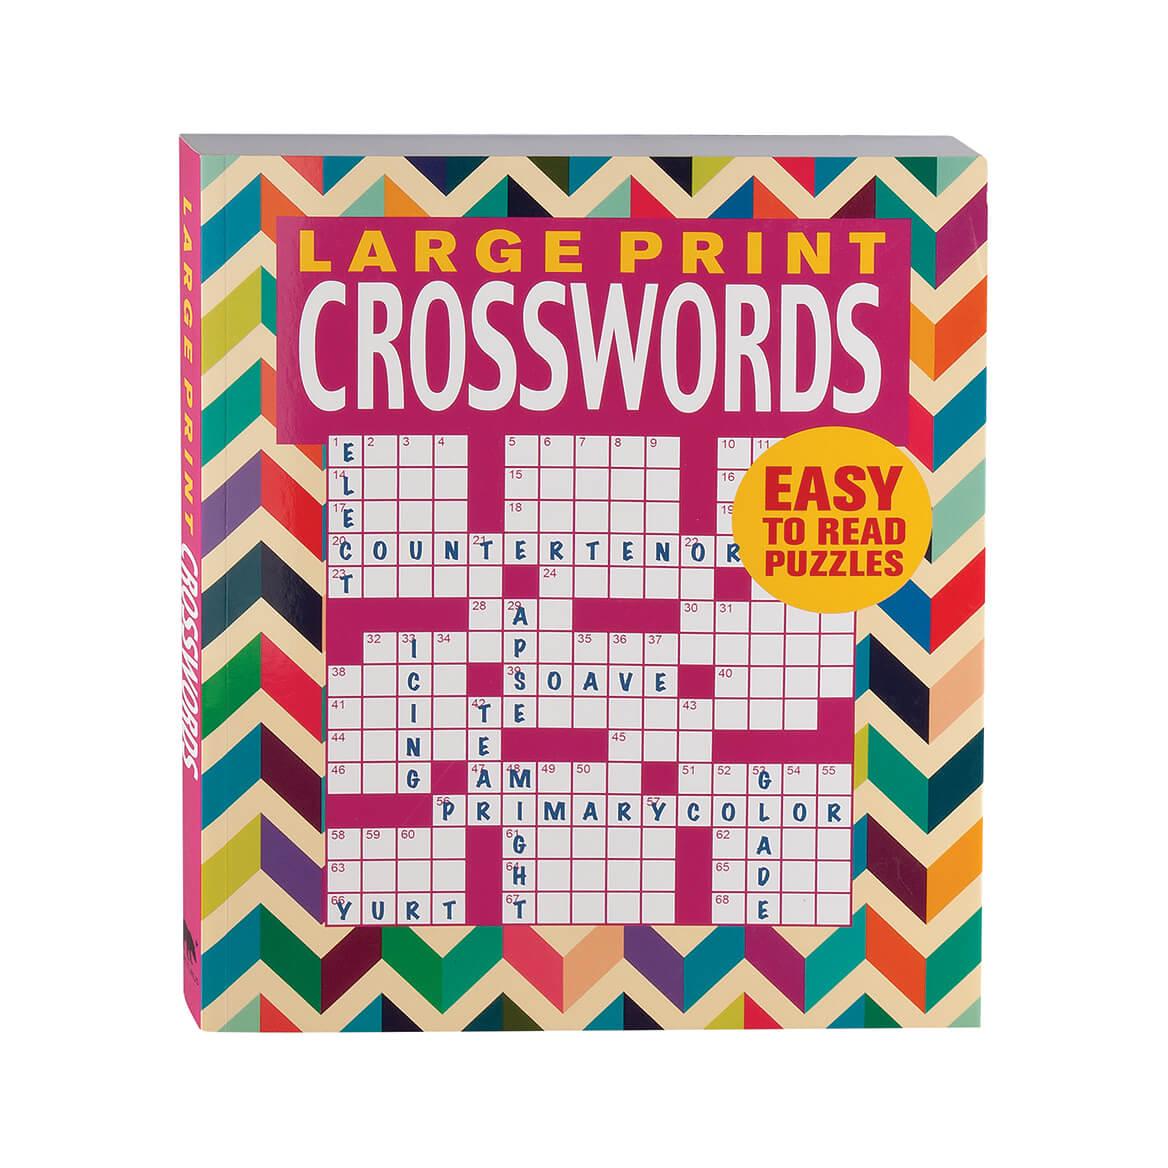 Large Print Crosswords Book - Puzzle Book - Miles Kimball - Large Print Crossword Puzzle Books